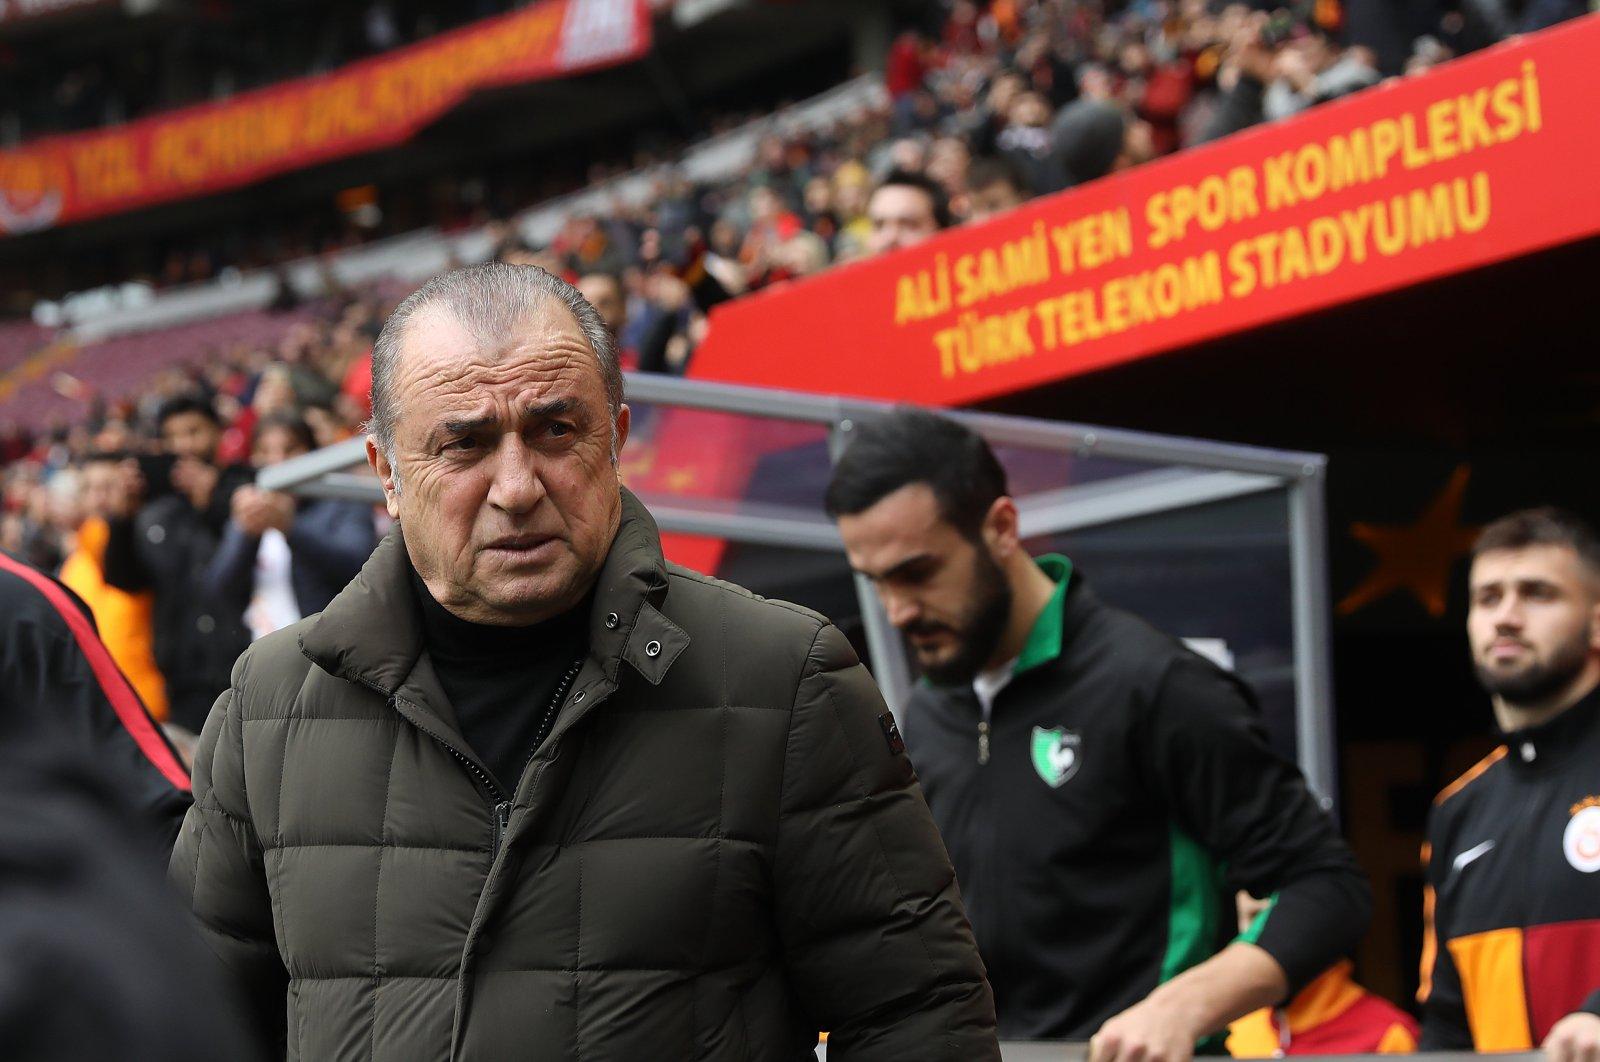 Galatasaray coach Fatih Terim on the sideline during a Süper Lig match against Denizlispor in Istanbul, Jan. 19, 2020. (AA Photo)